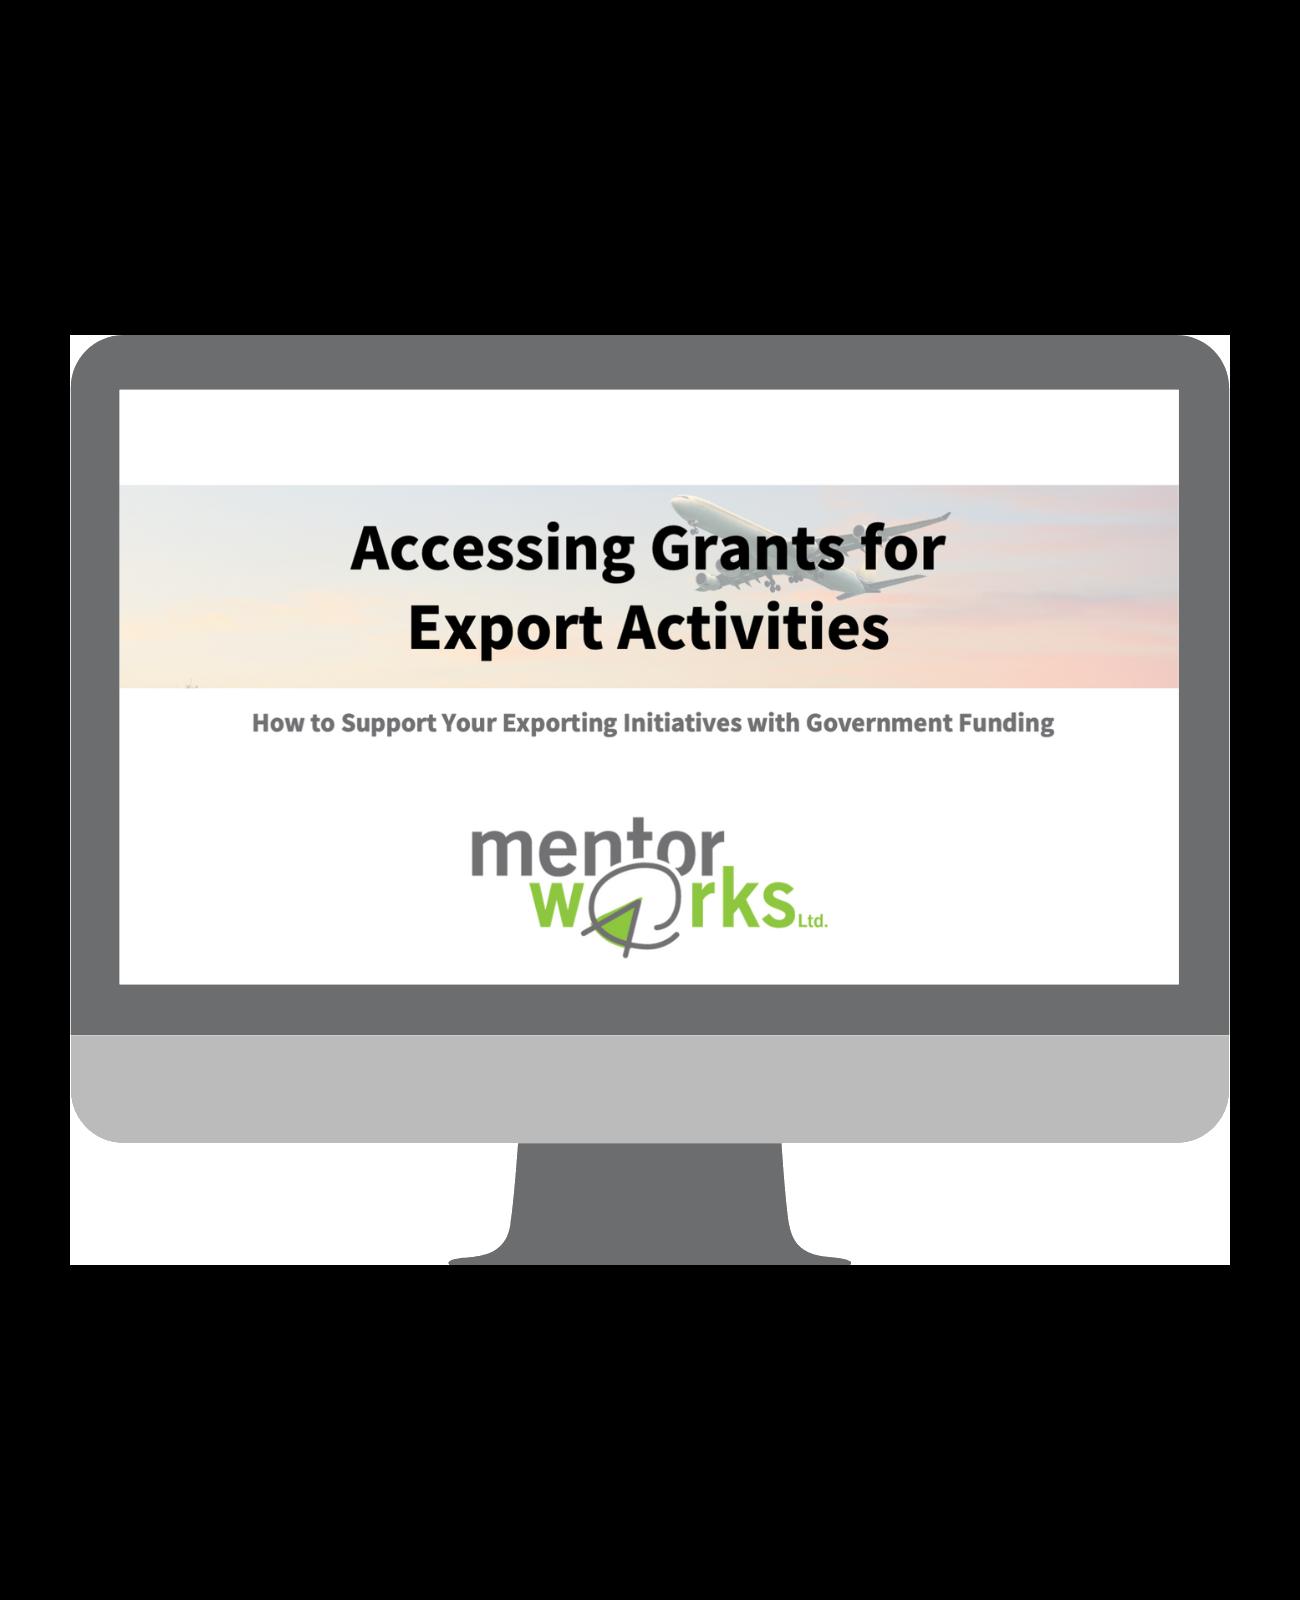 Accessing Grants for Export Activities